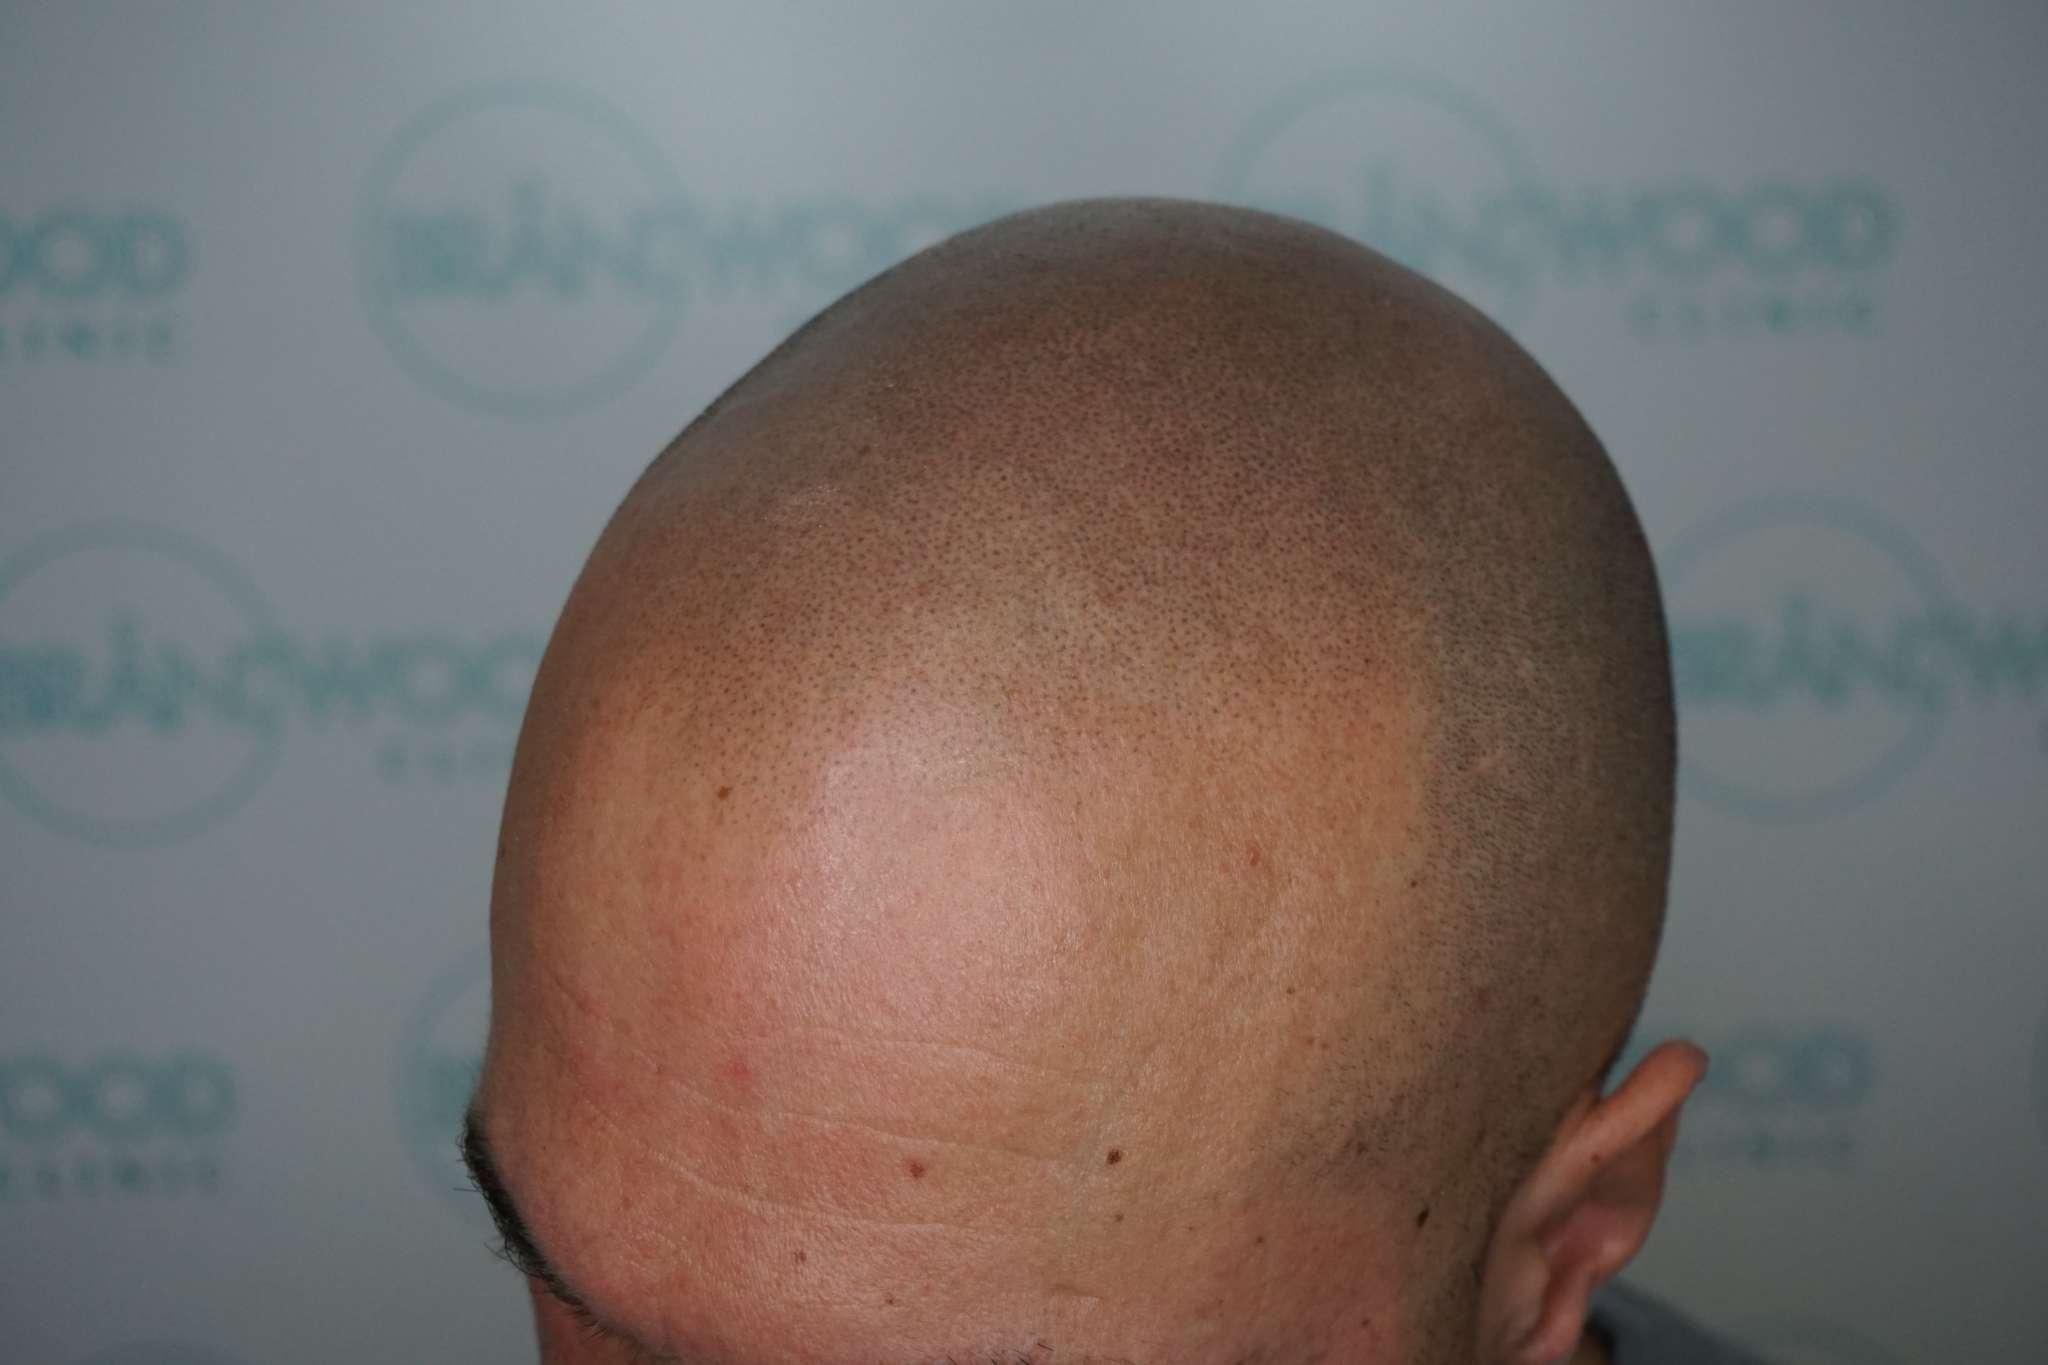 SMP treatment one, male pattern baldness